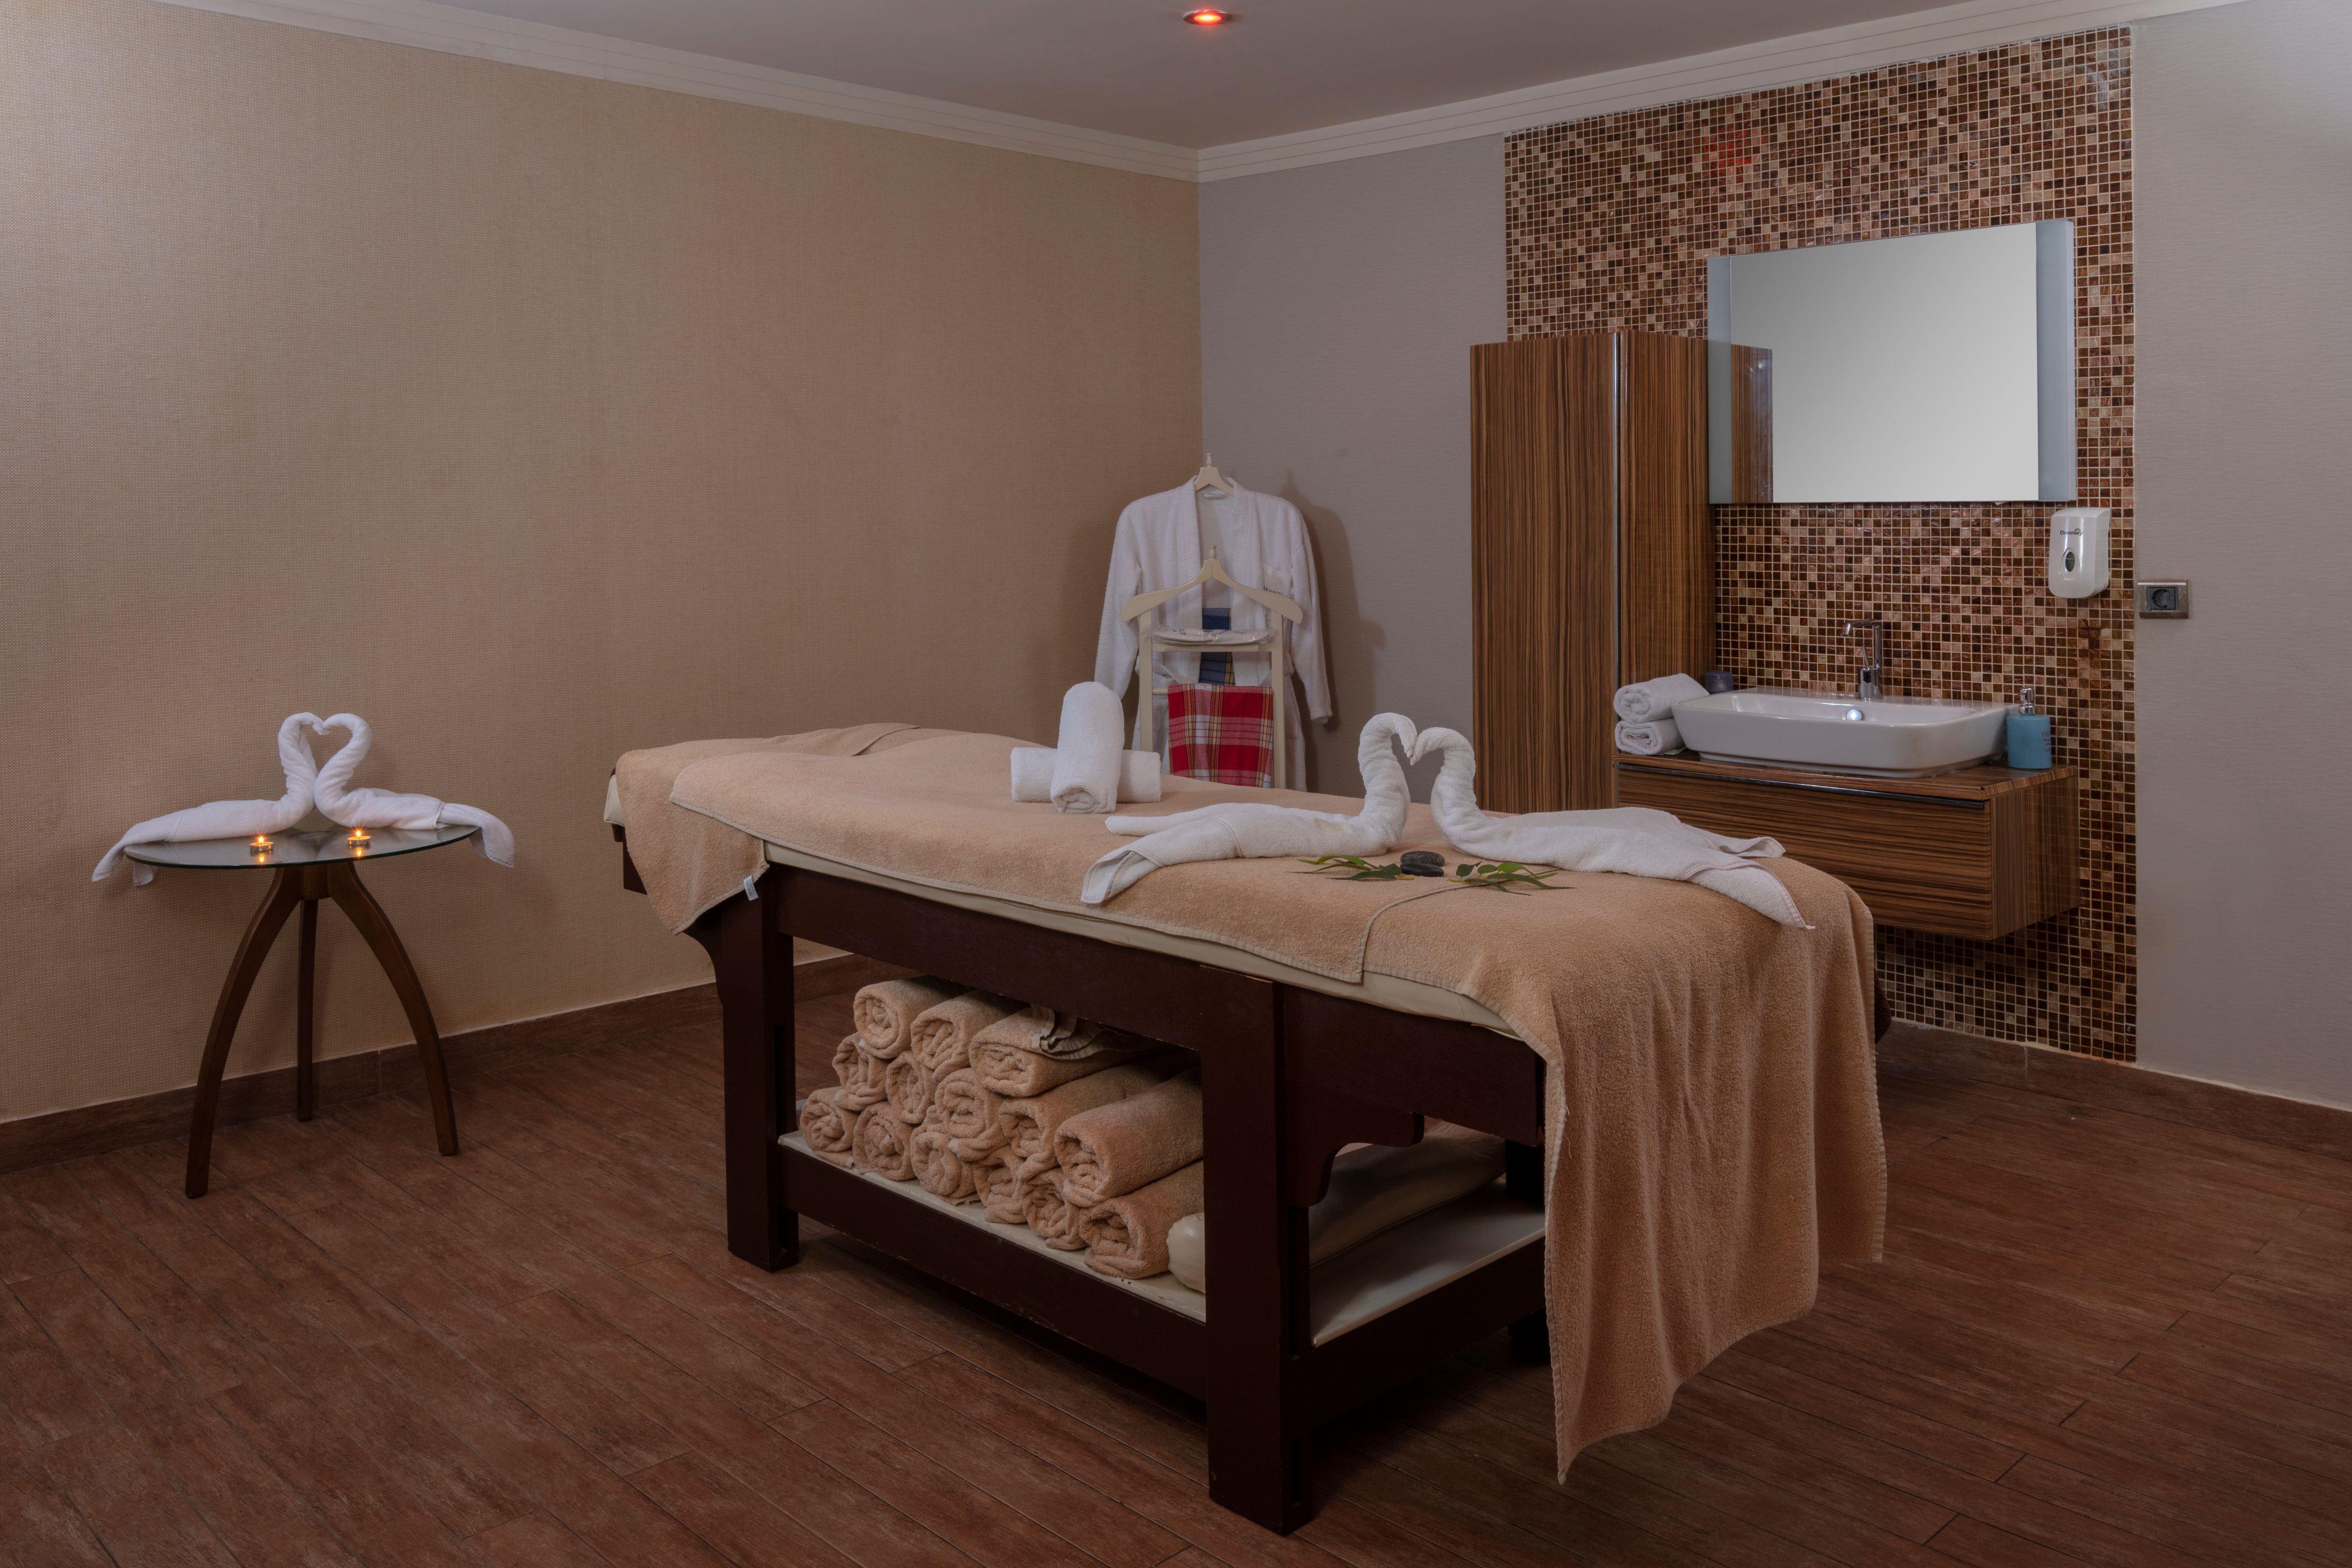 http://www.orextravel.sk/OREX/hotelphotos/zeynep-hotel-general-0027.jpg